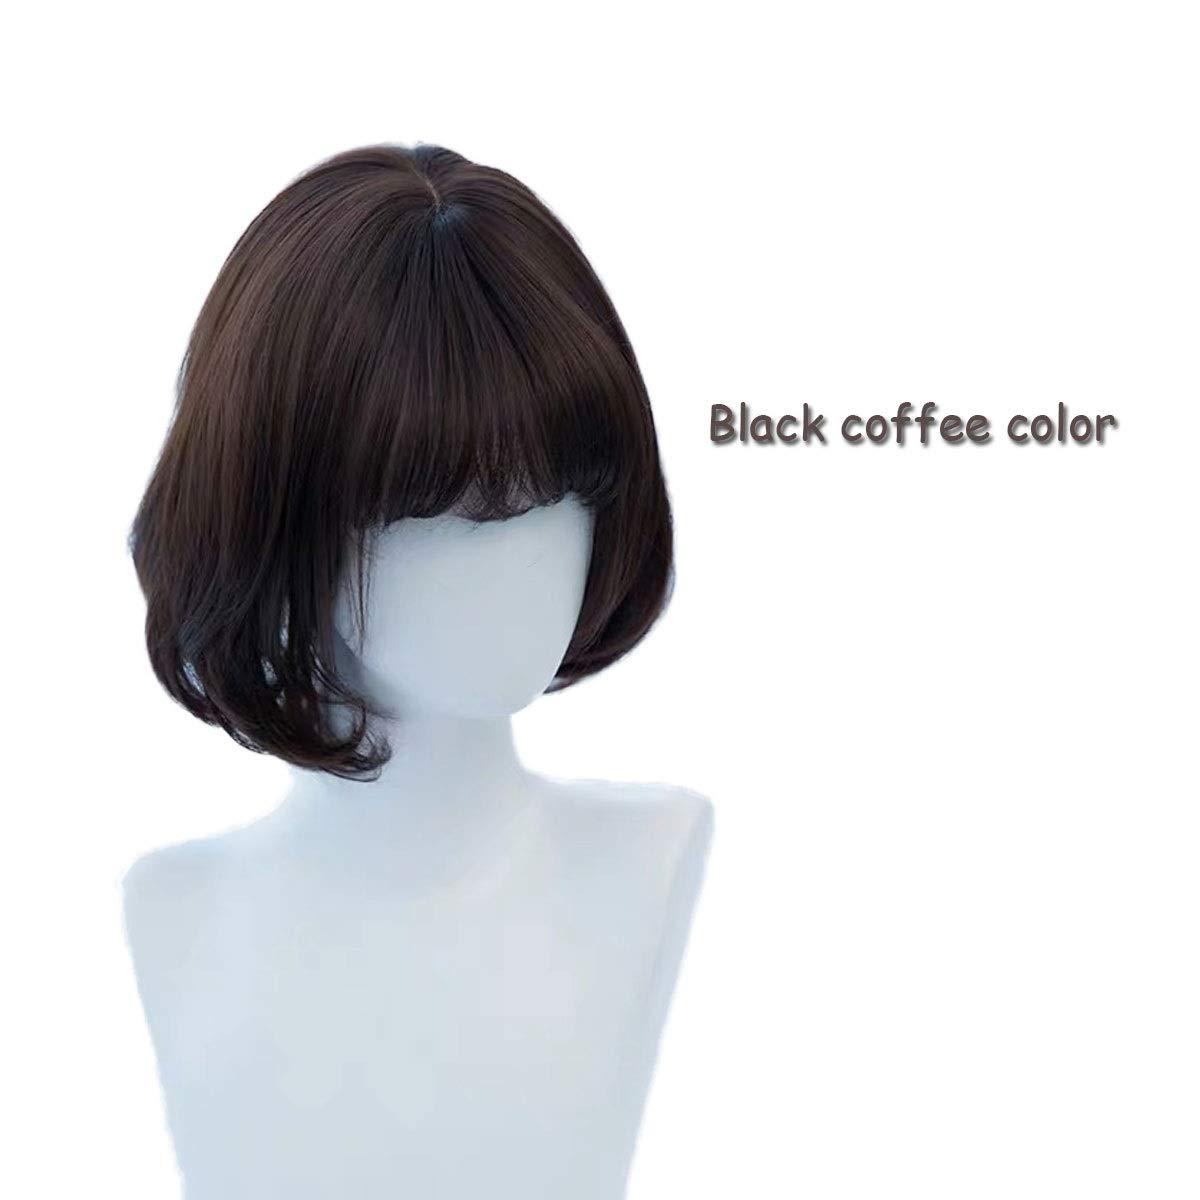 Web oficial Fengkuo Peluca Cabello Corto Corto Corto Femenino Cabezal Bobo Headgear Completo Hebilla Interior rojo Corto rojo Peluca de Pelo Rizado Conjunto Peluca Llena ( Color   negro Coffee )  moda